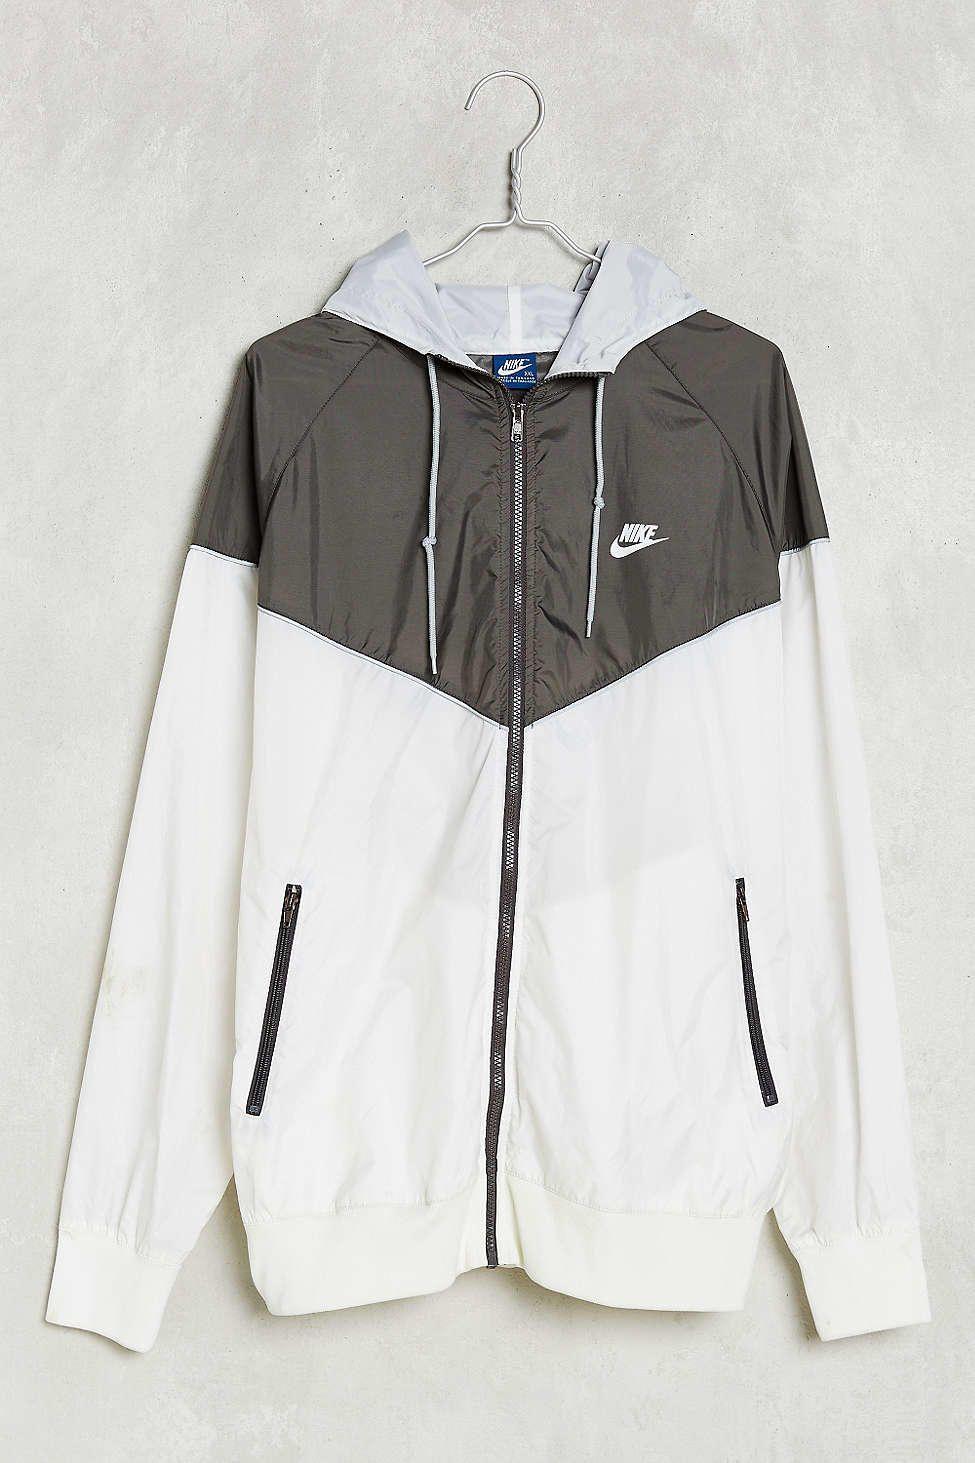 Vintage Nike Windbreaker Jacket Urban Outfitters from